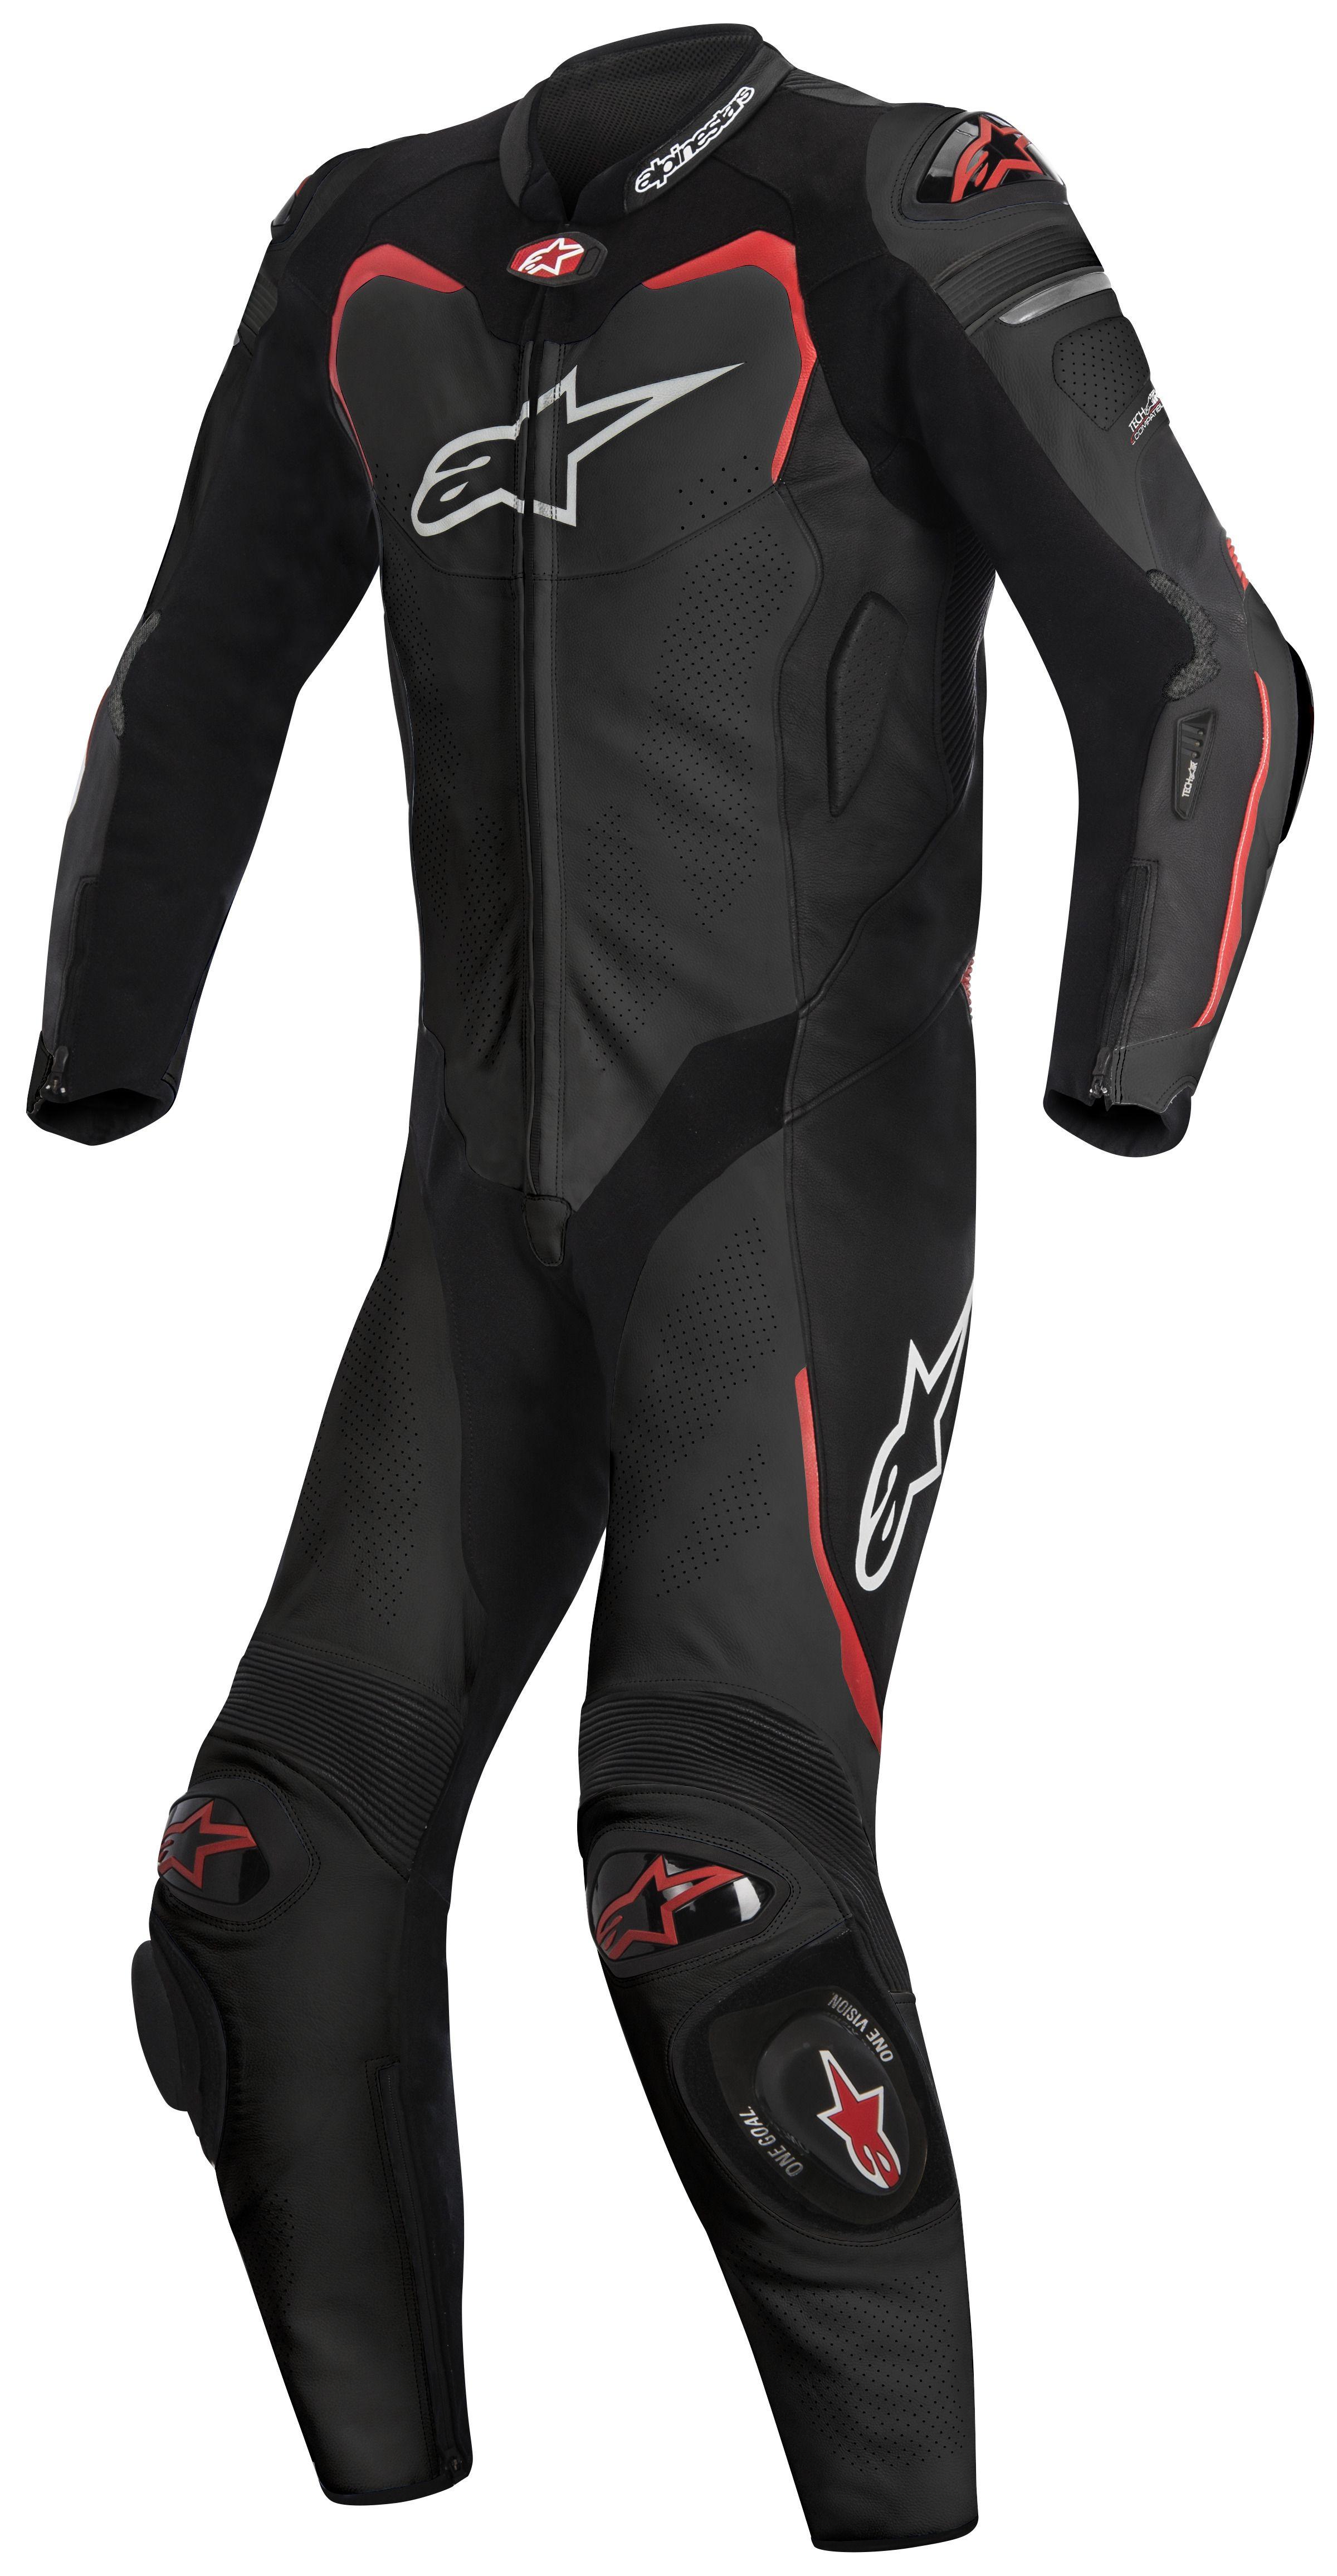 Alpinestars Gp Pro Leather Suit For Tech Air Race Revzilla